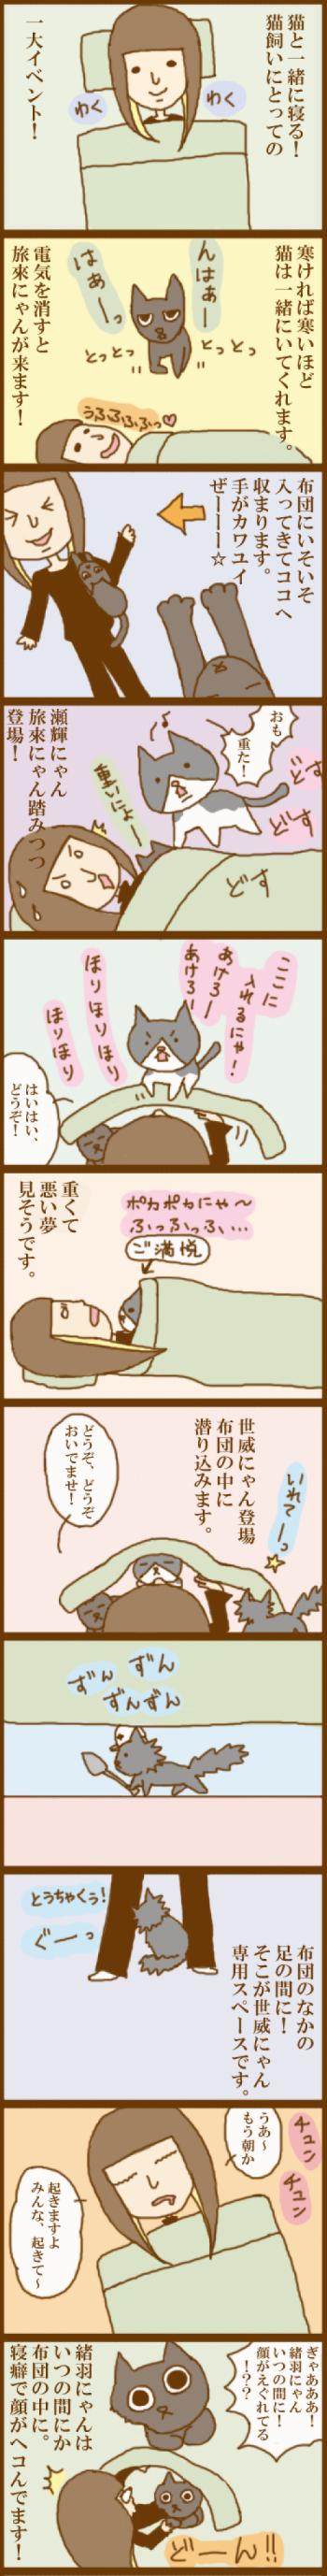 f:id:suzuokayu:20201114174803j:plain